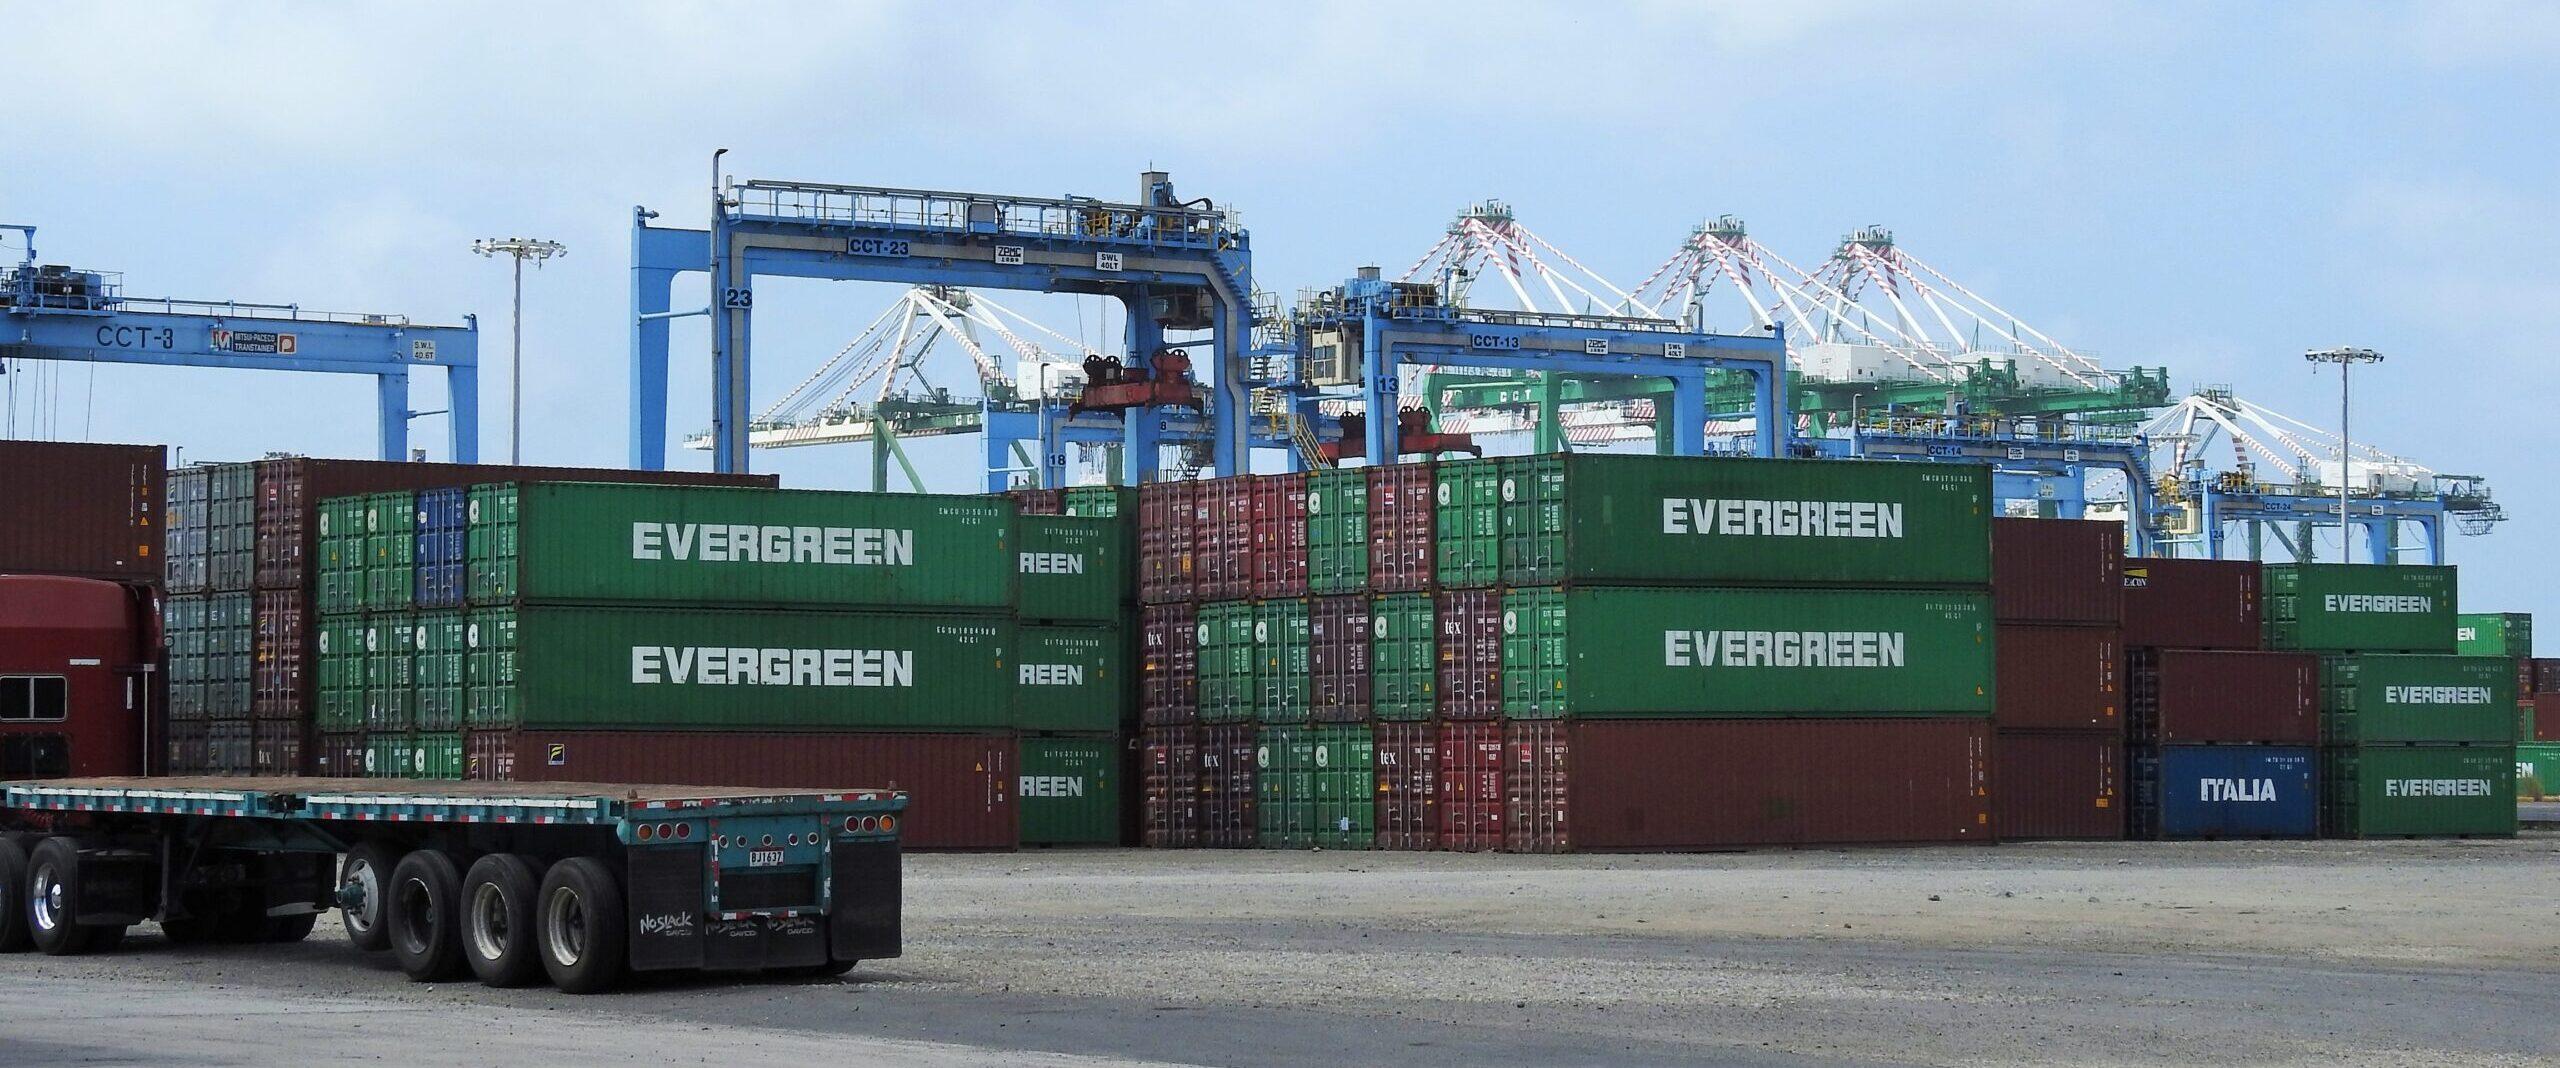 05 – Containerverschiffung von Cartagena (Kolumbien) nach Colón (Panama)